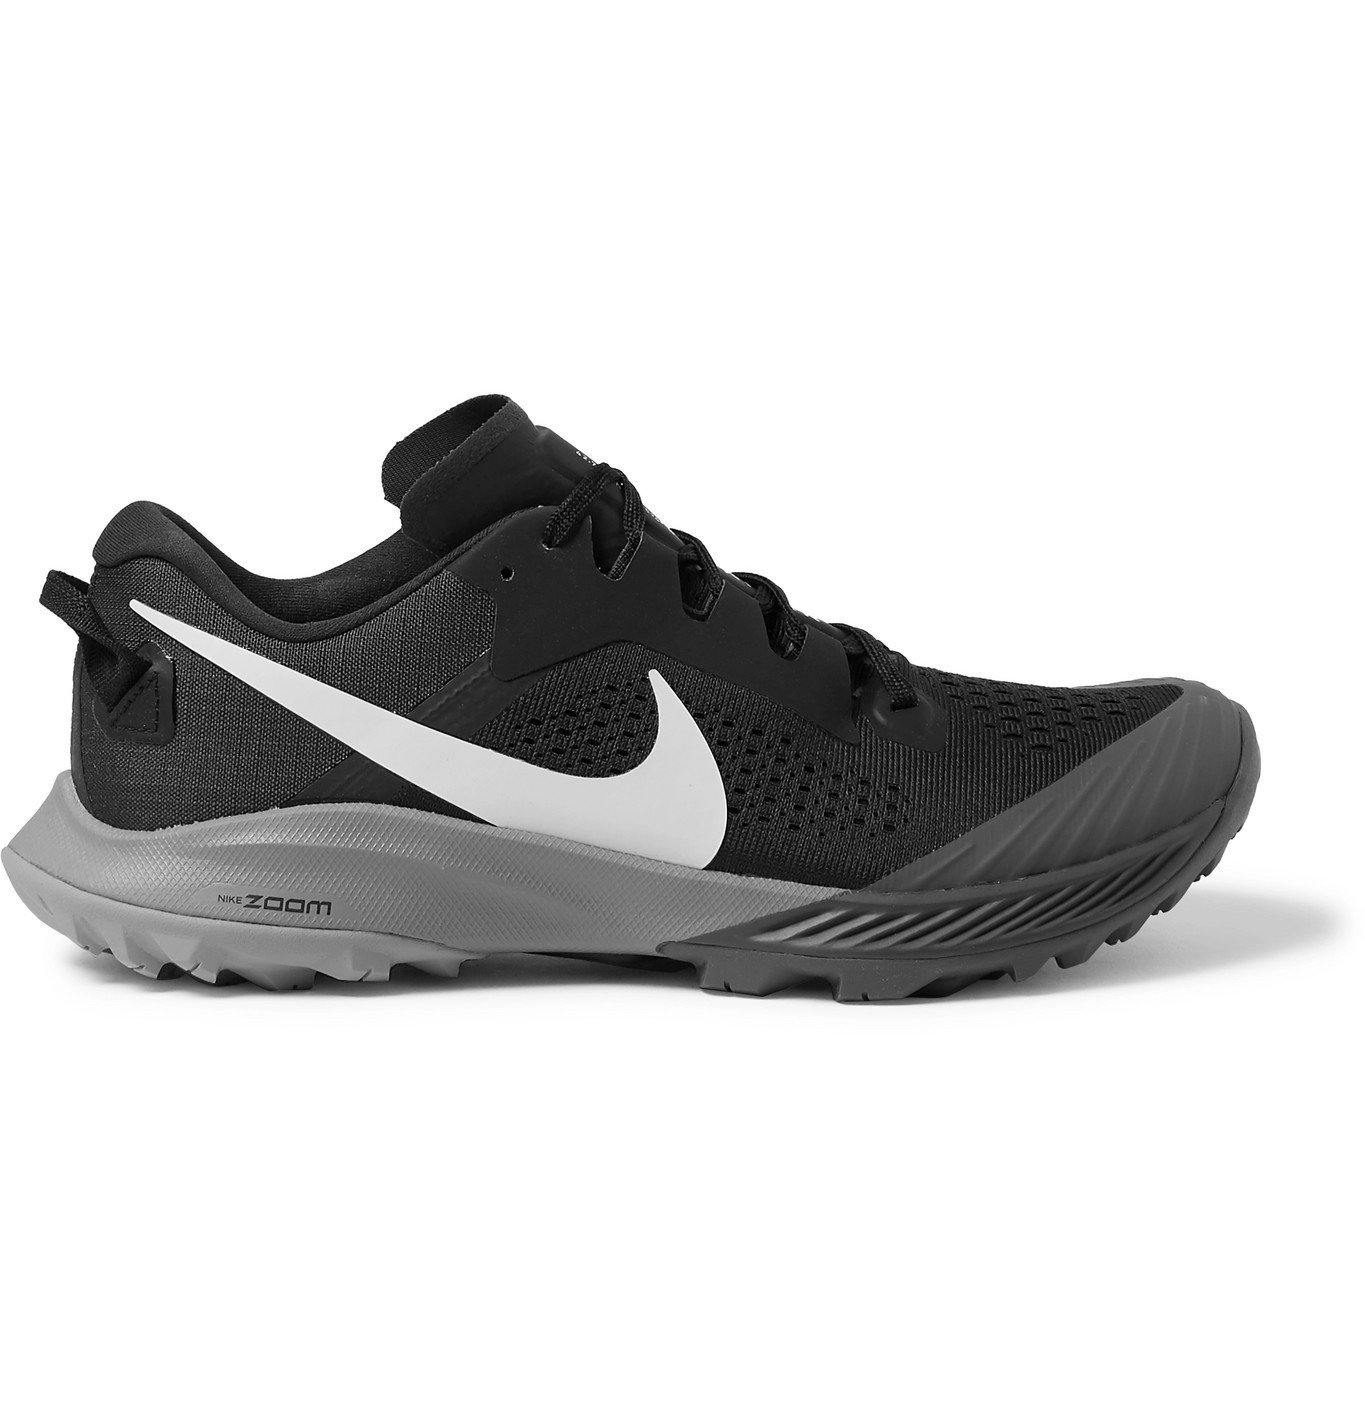 Nike Running - Air Zoom Terra Kiger 6 Rubber-Trimmed Mesh Trail Running Sneakers - Black